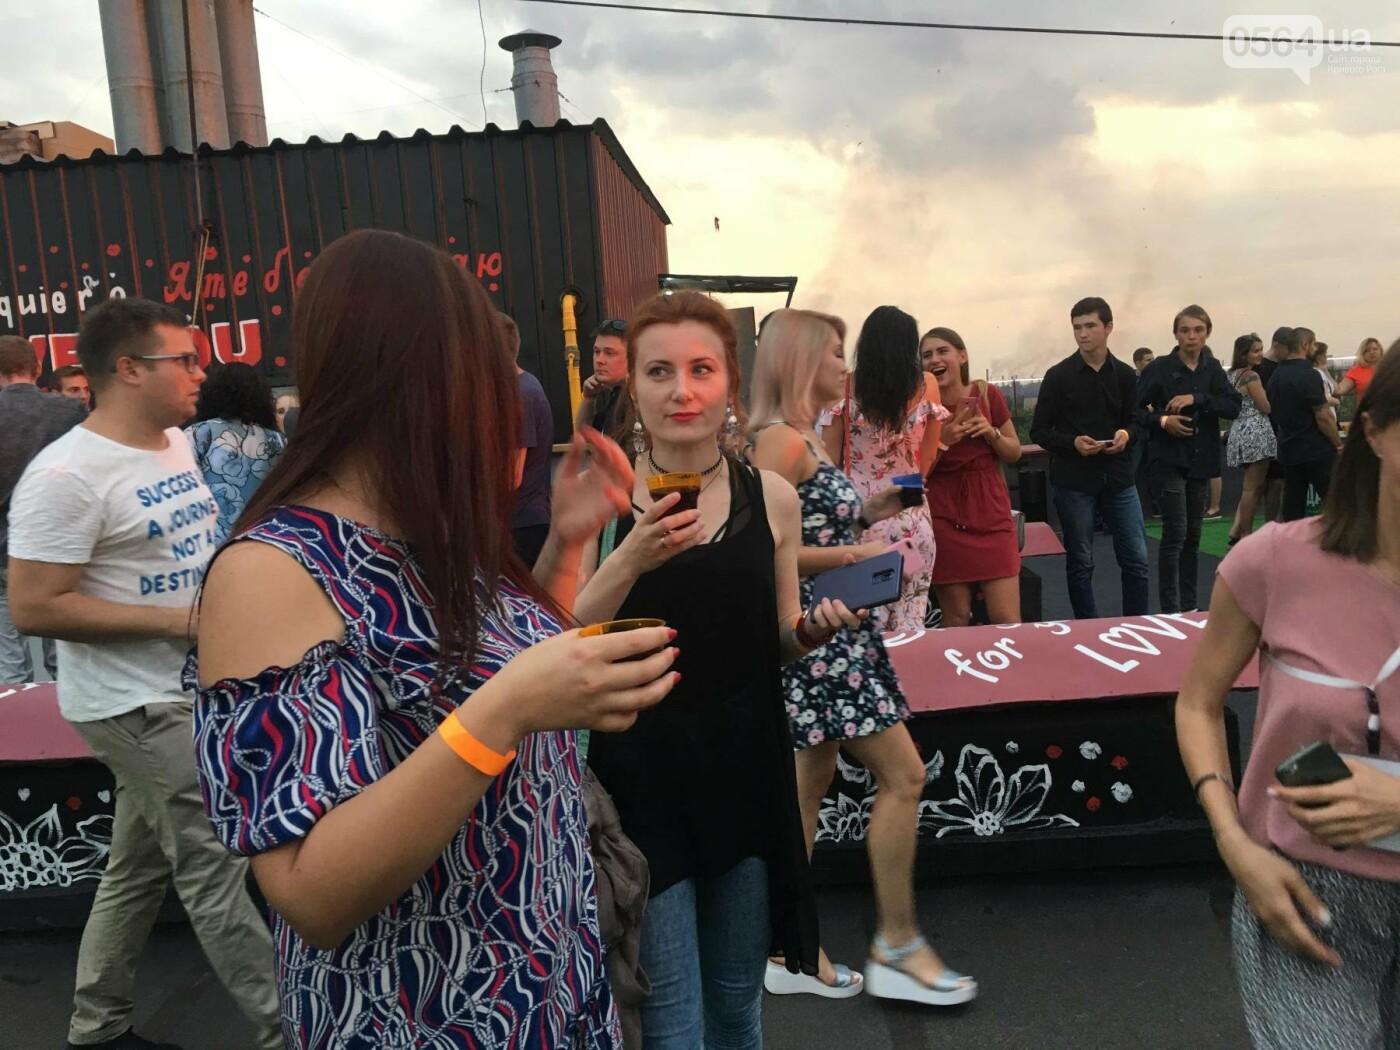 Сотни криворожан встречали закат на крыше отеля под мелодии джаза, - ФОТО, ВИДЕО, фото-47